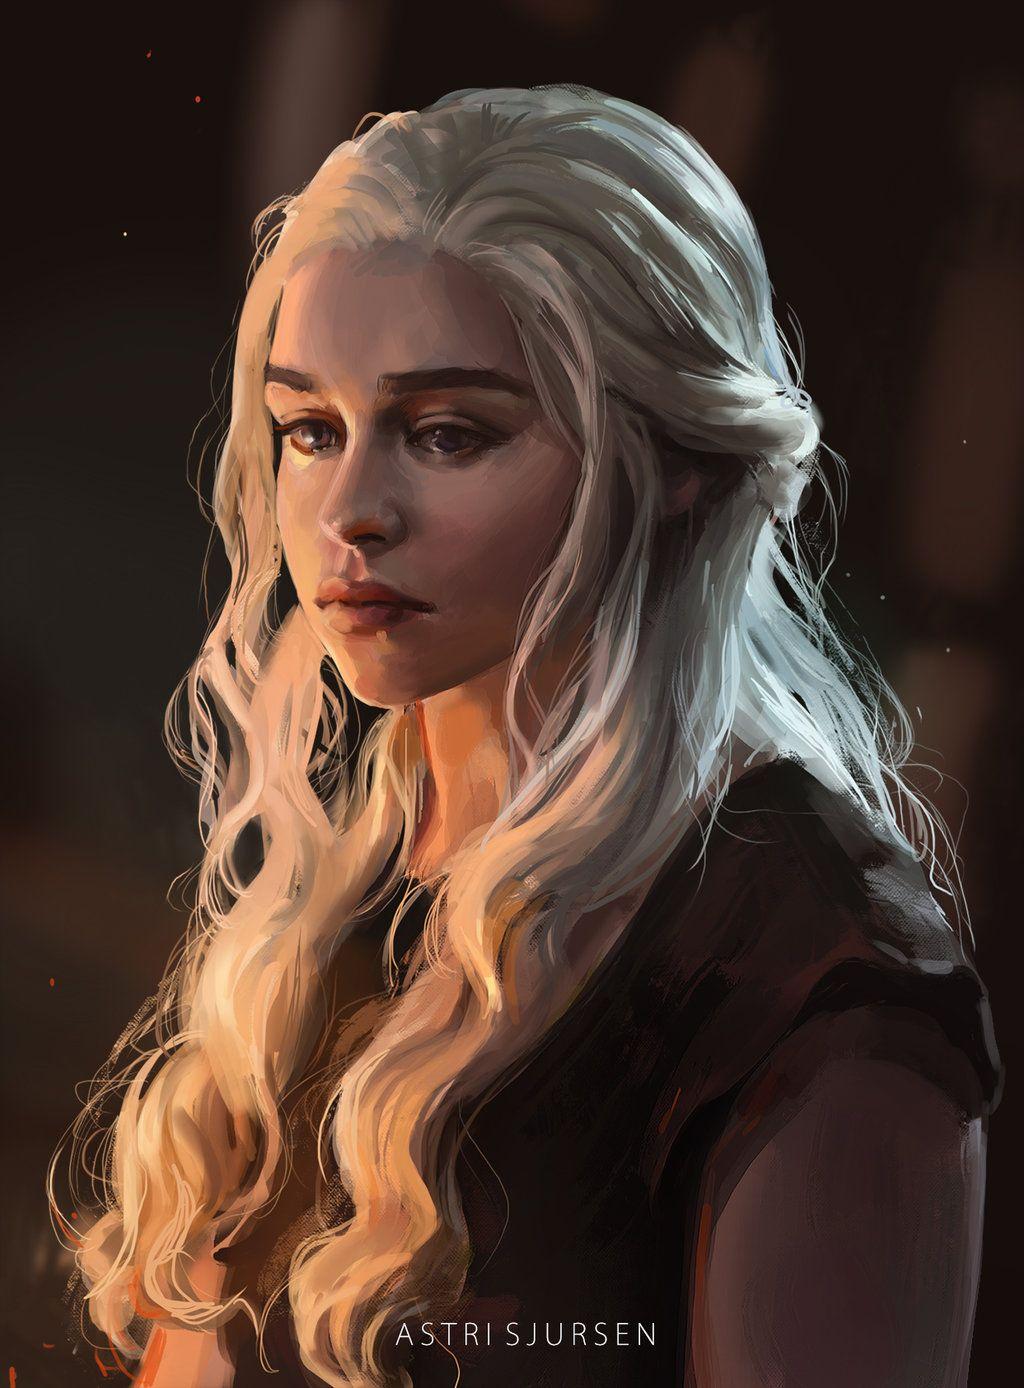 Dany Astrisjursen On Deviantart Lohne Targaryen Art Daenerys